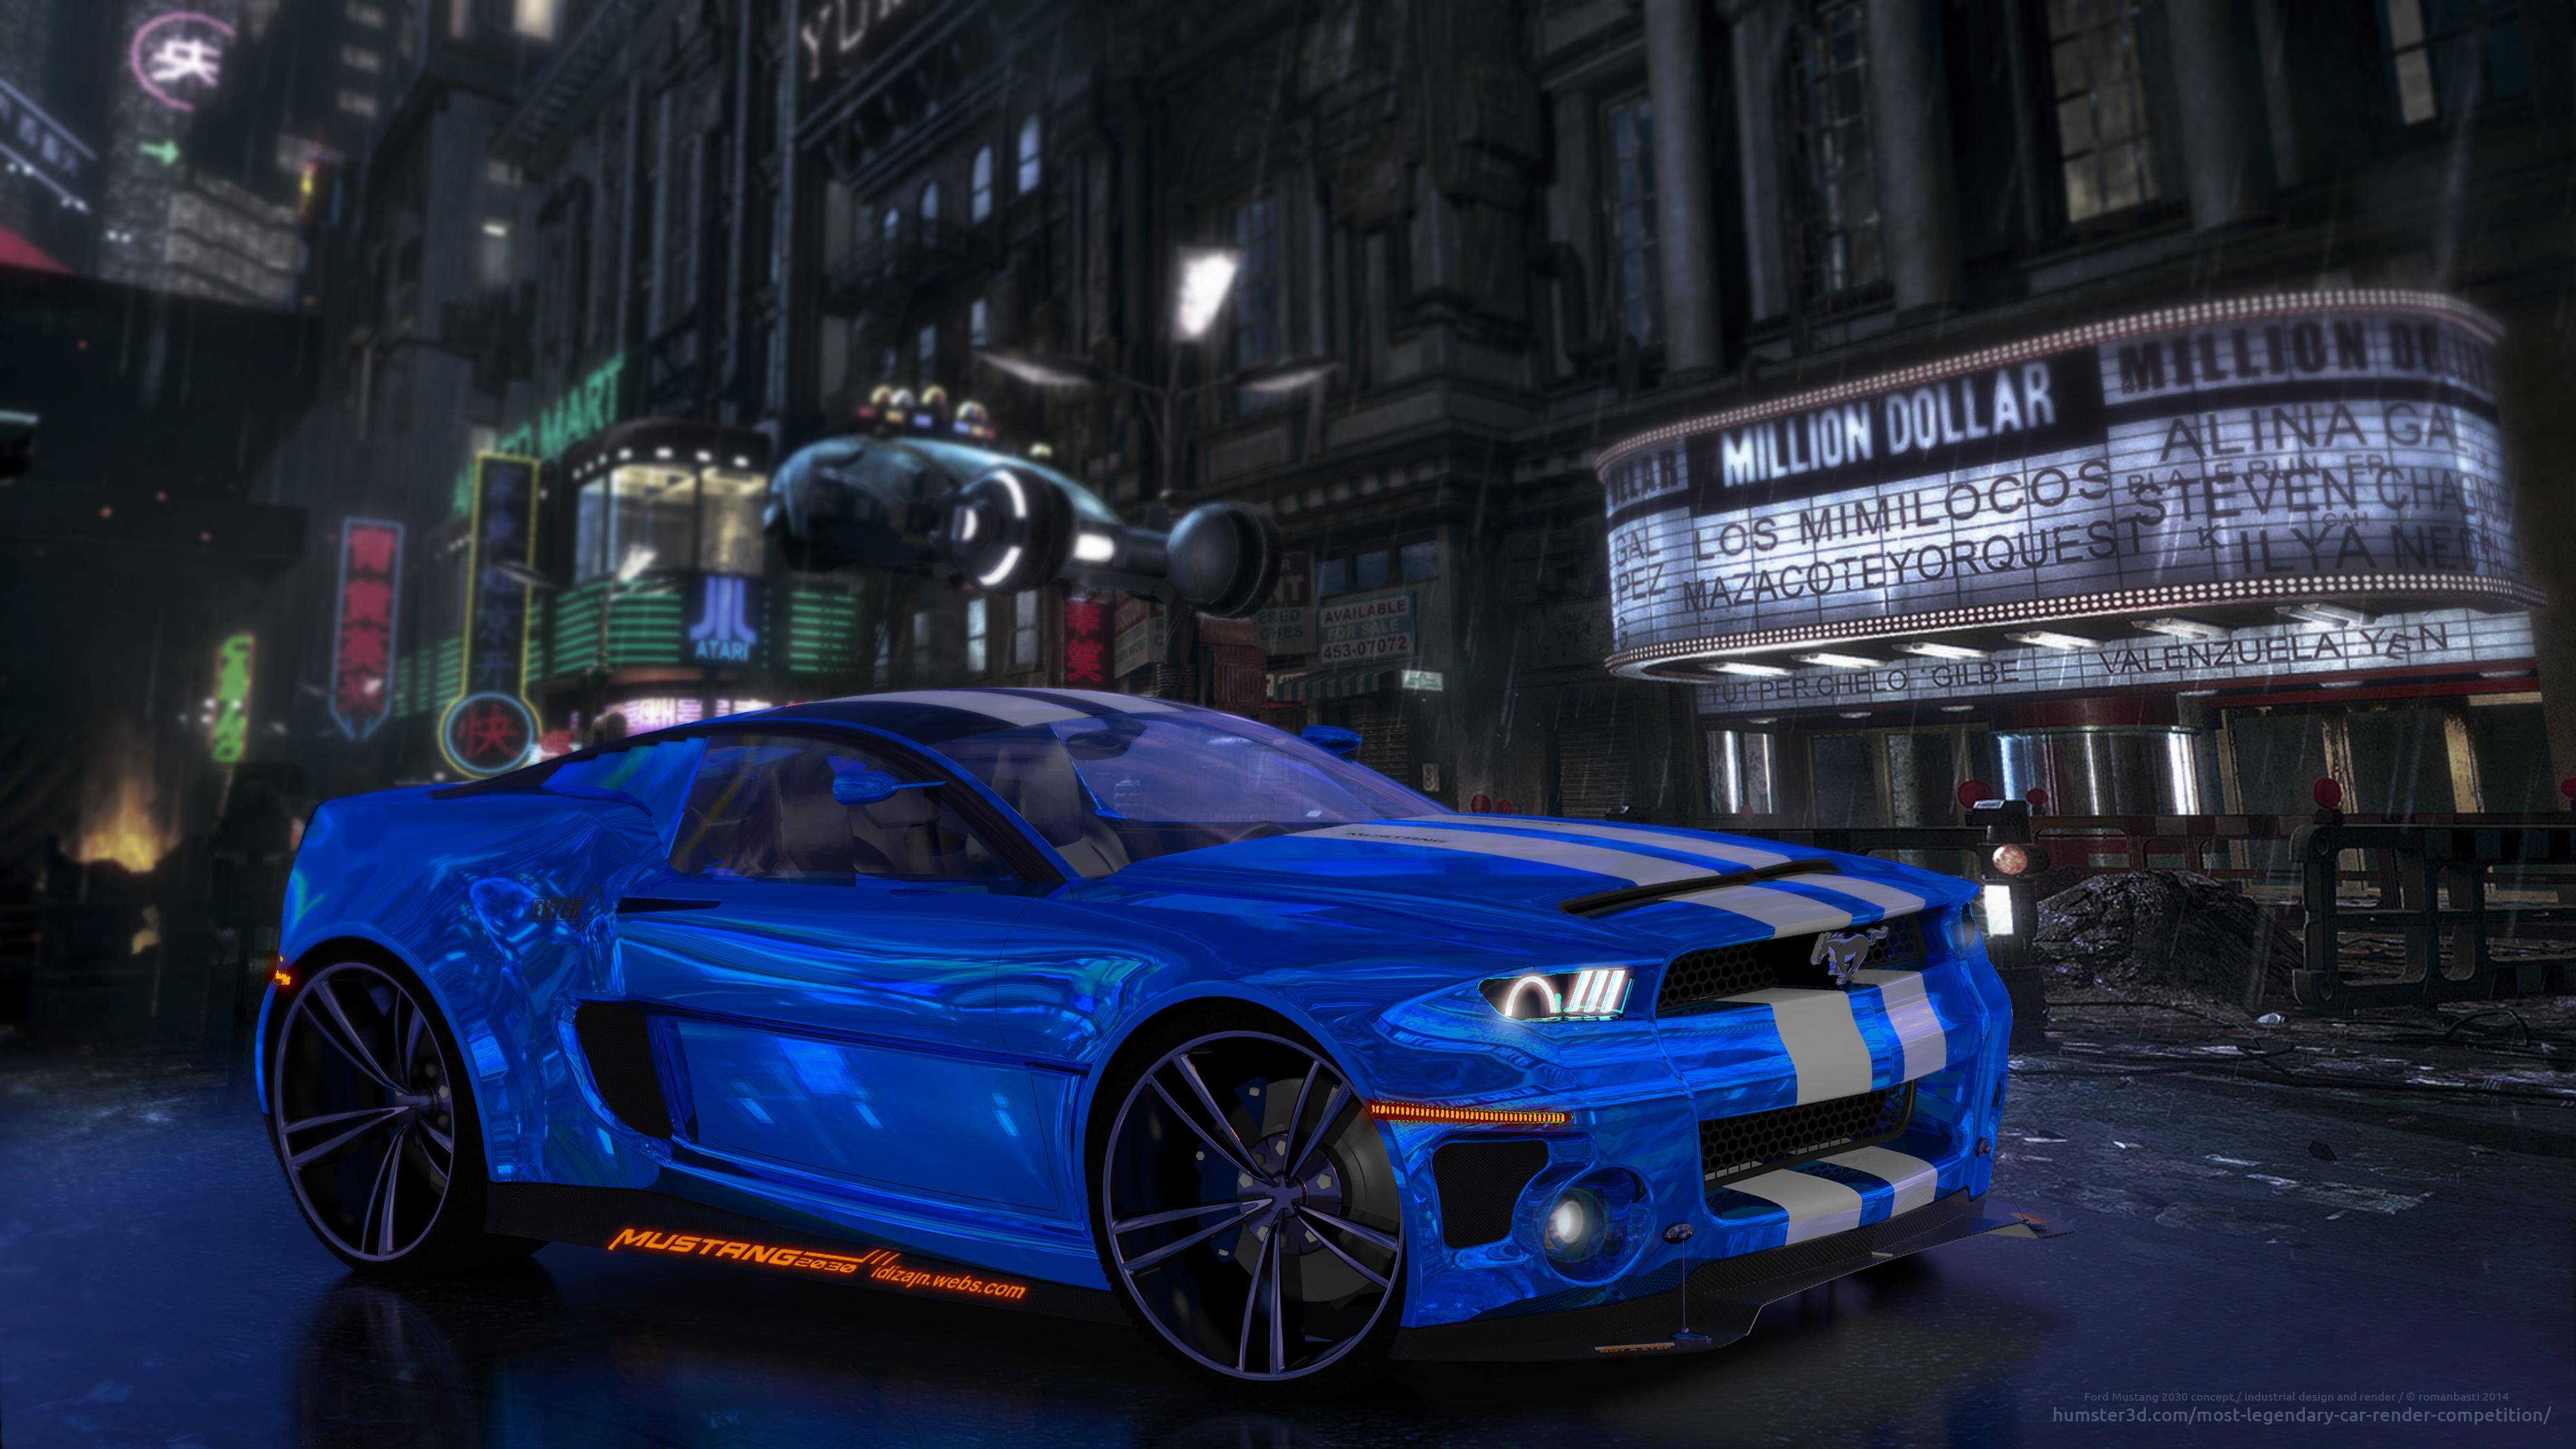 Ford Mustang 2030 Concept 3d art